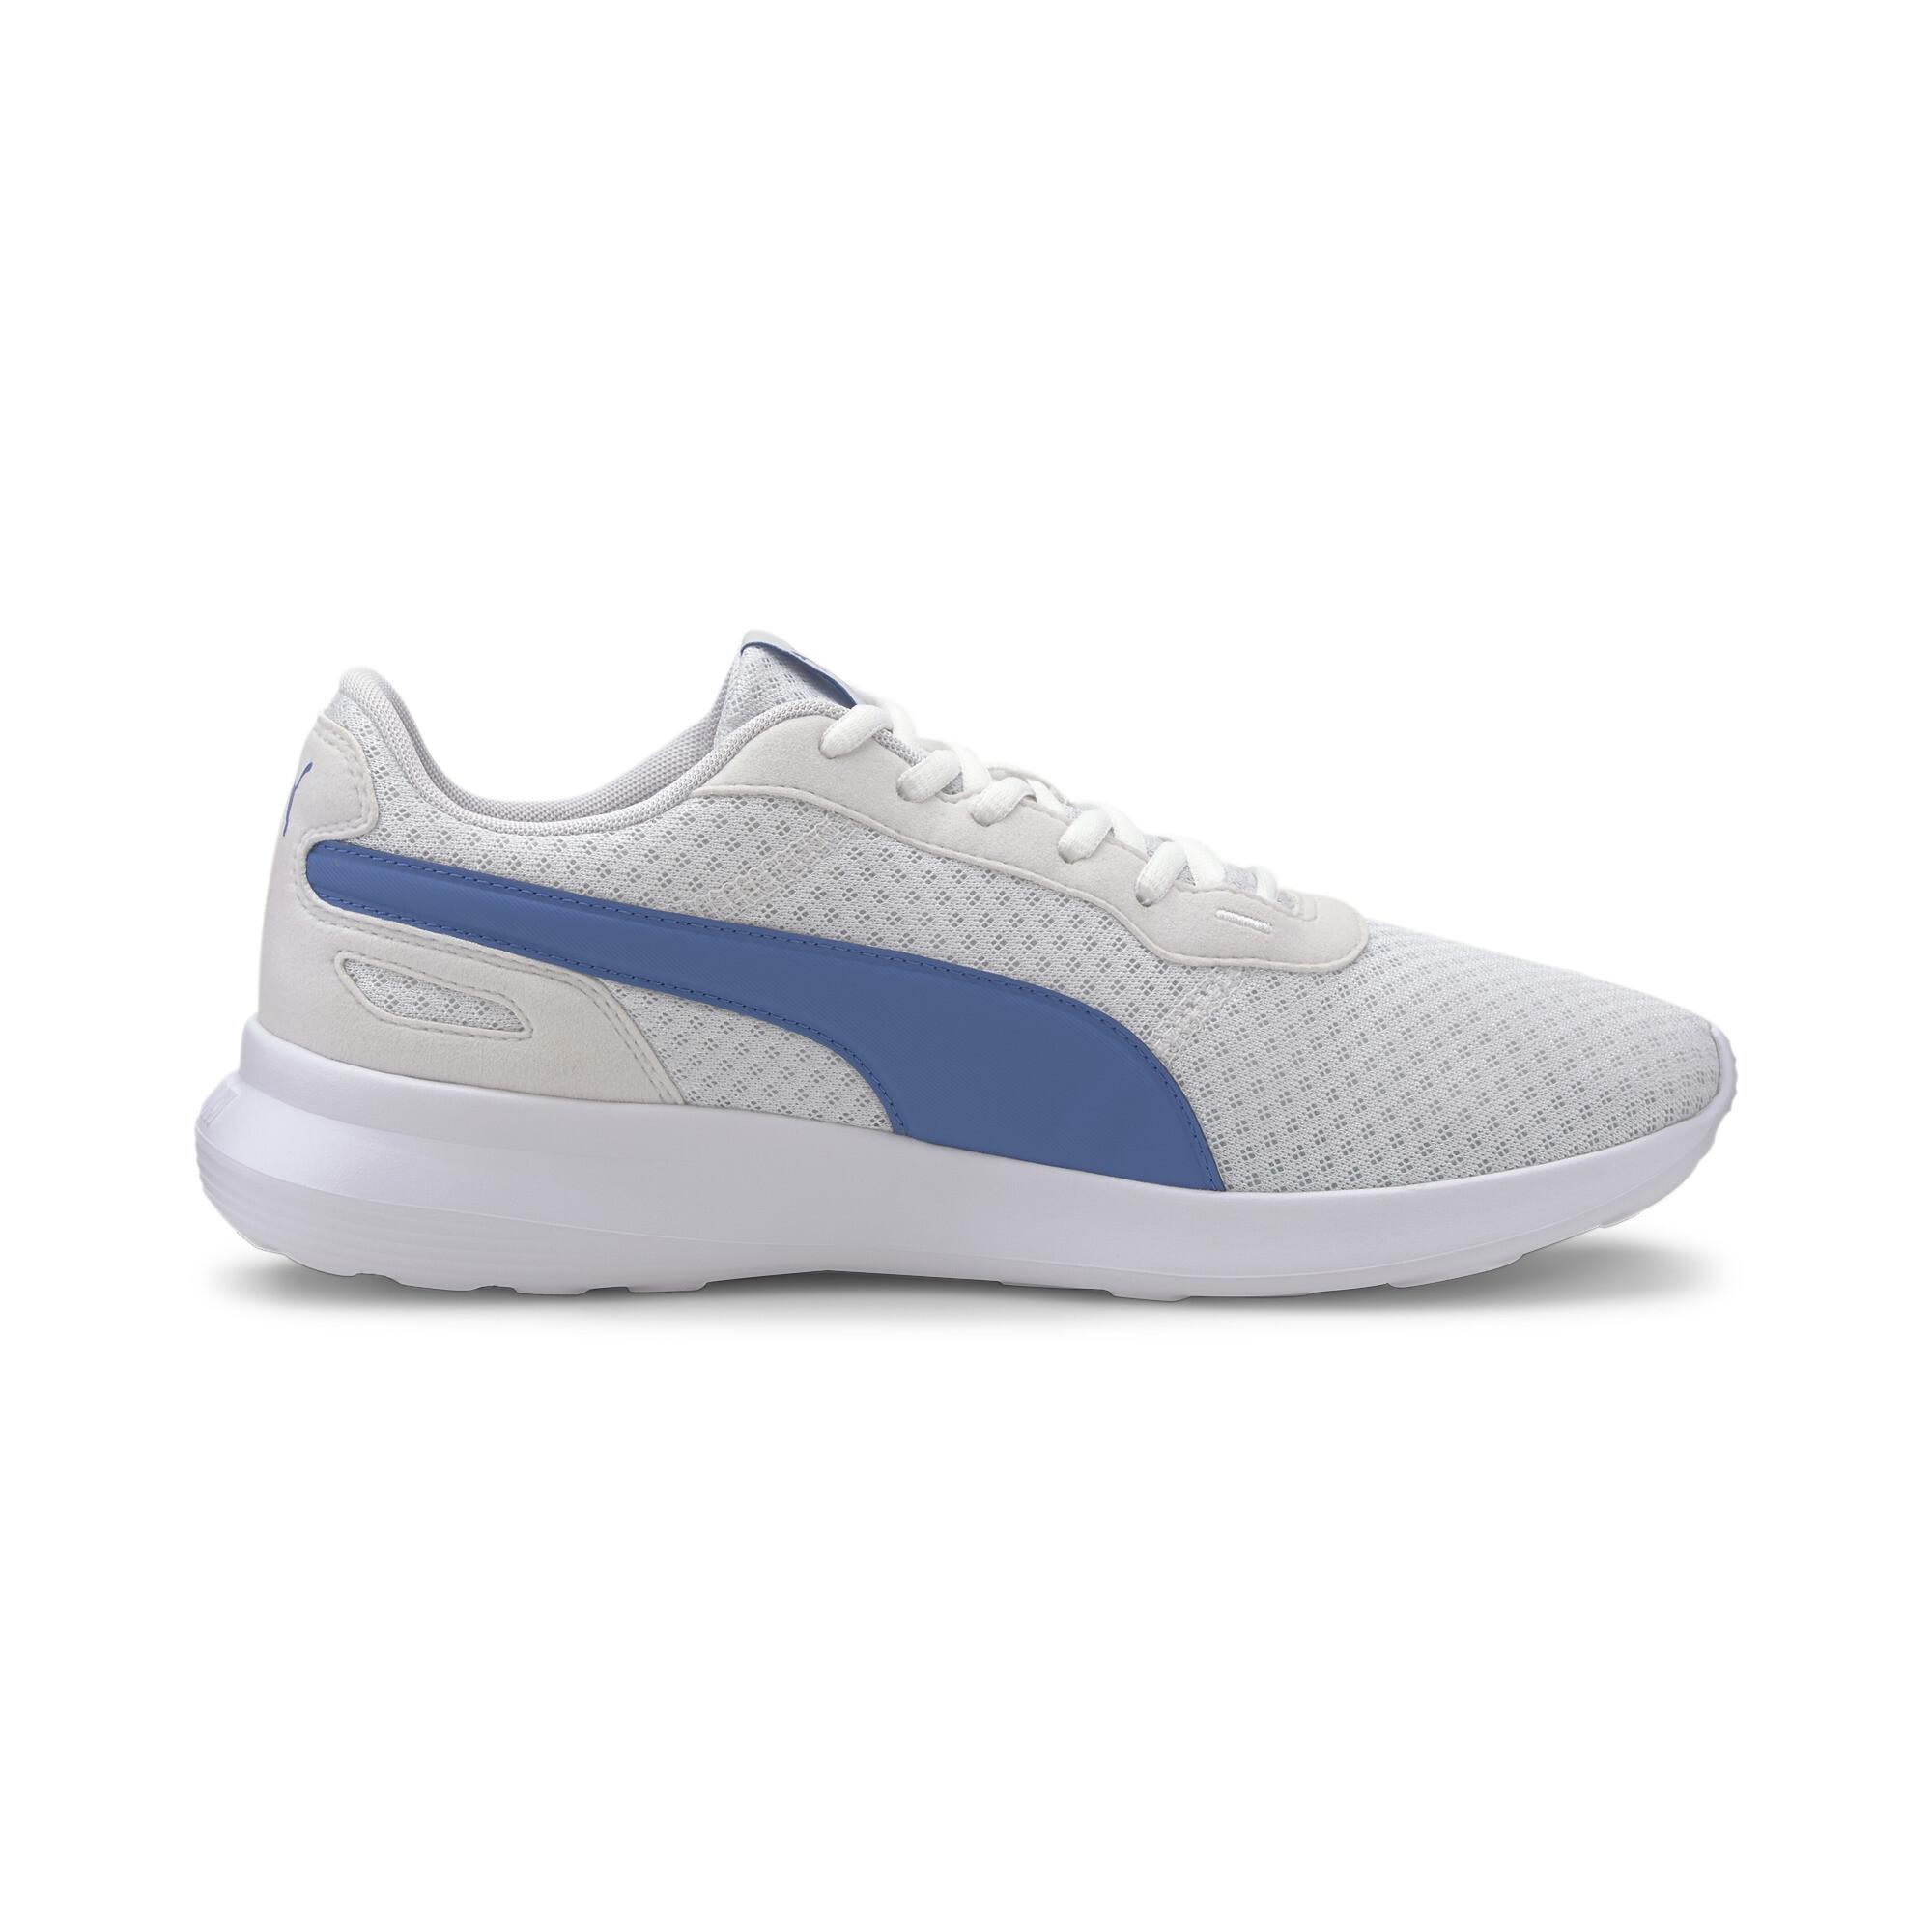 PUMA-Men-039-s-ST-Activate-Sneakers thumbnail 29